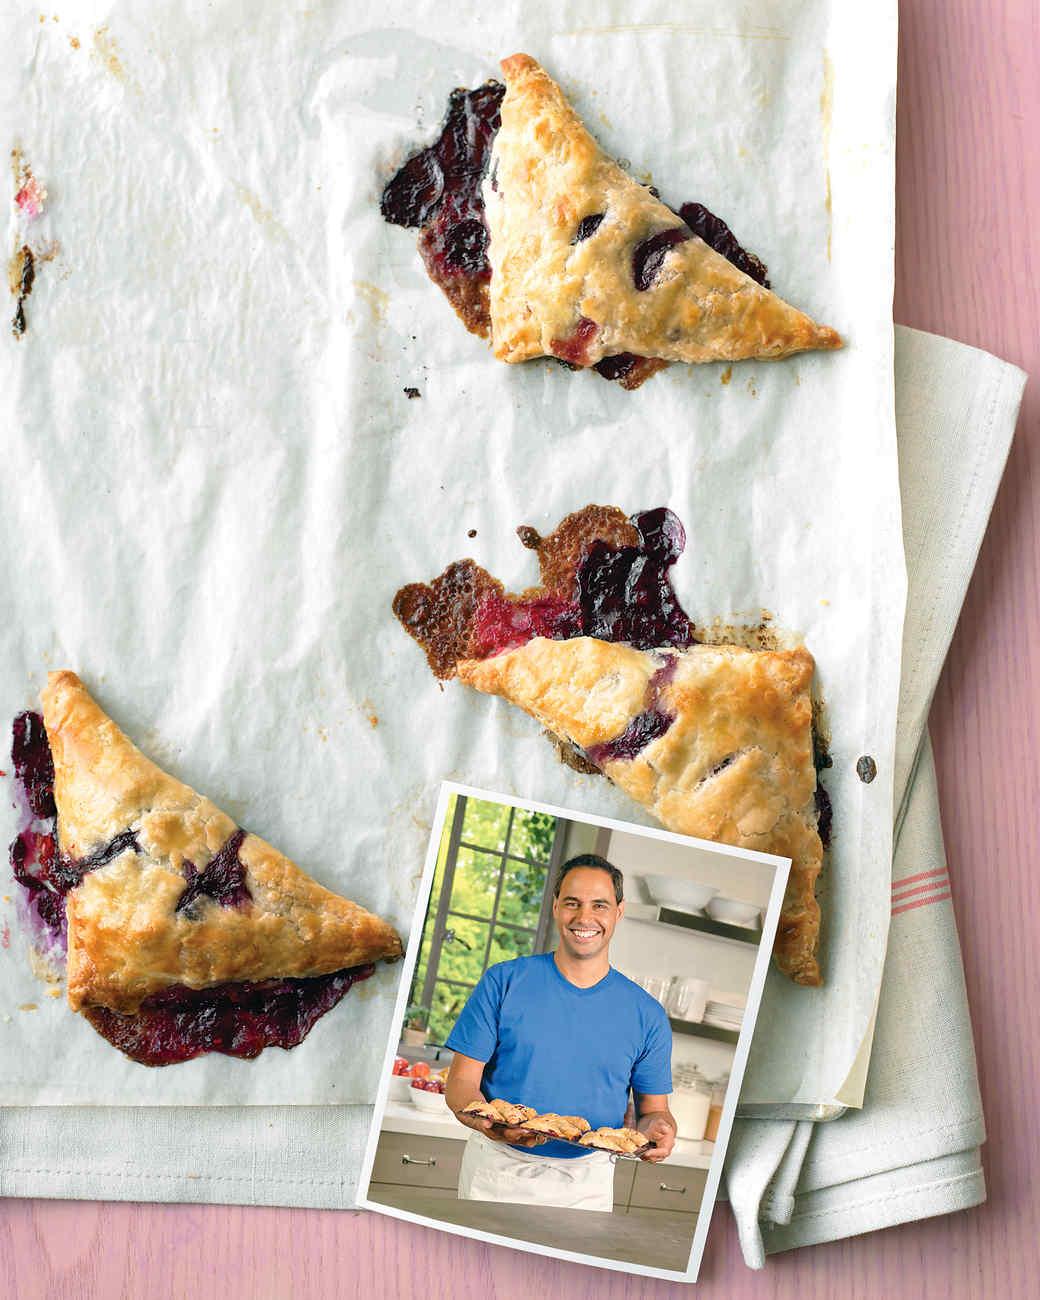 John's Mixed-Berry Turnovers